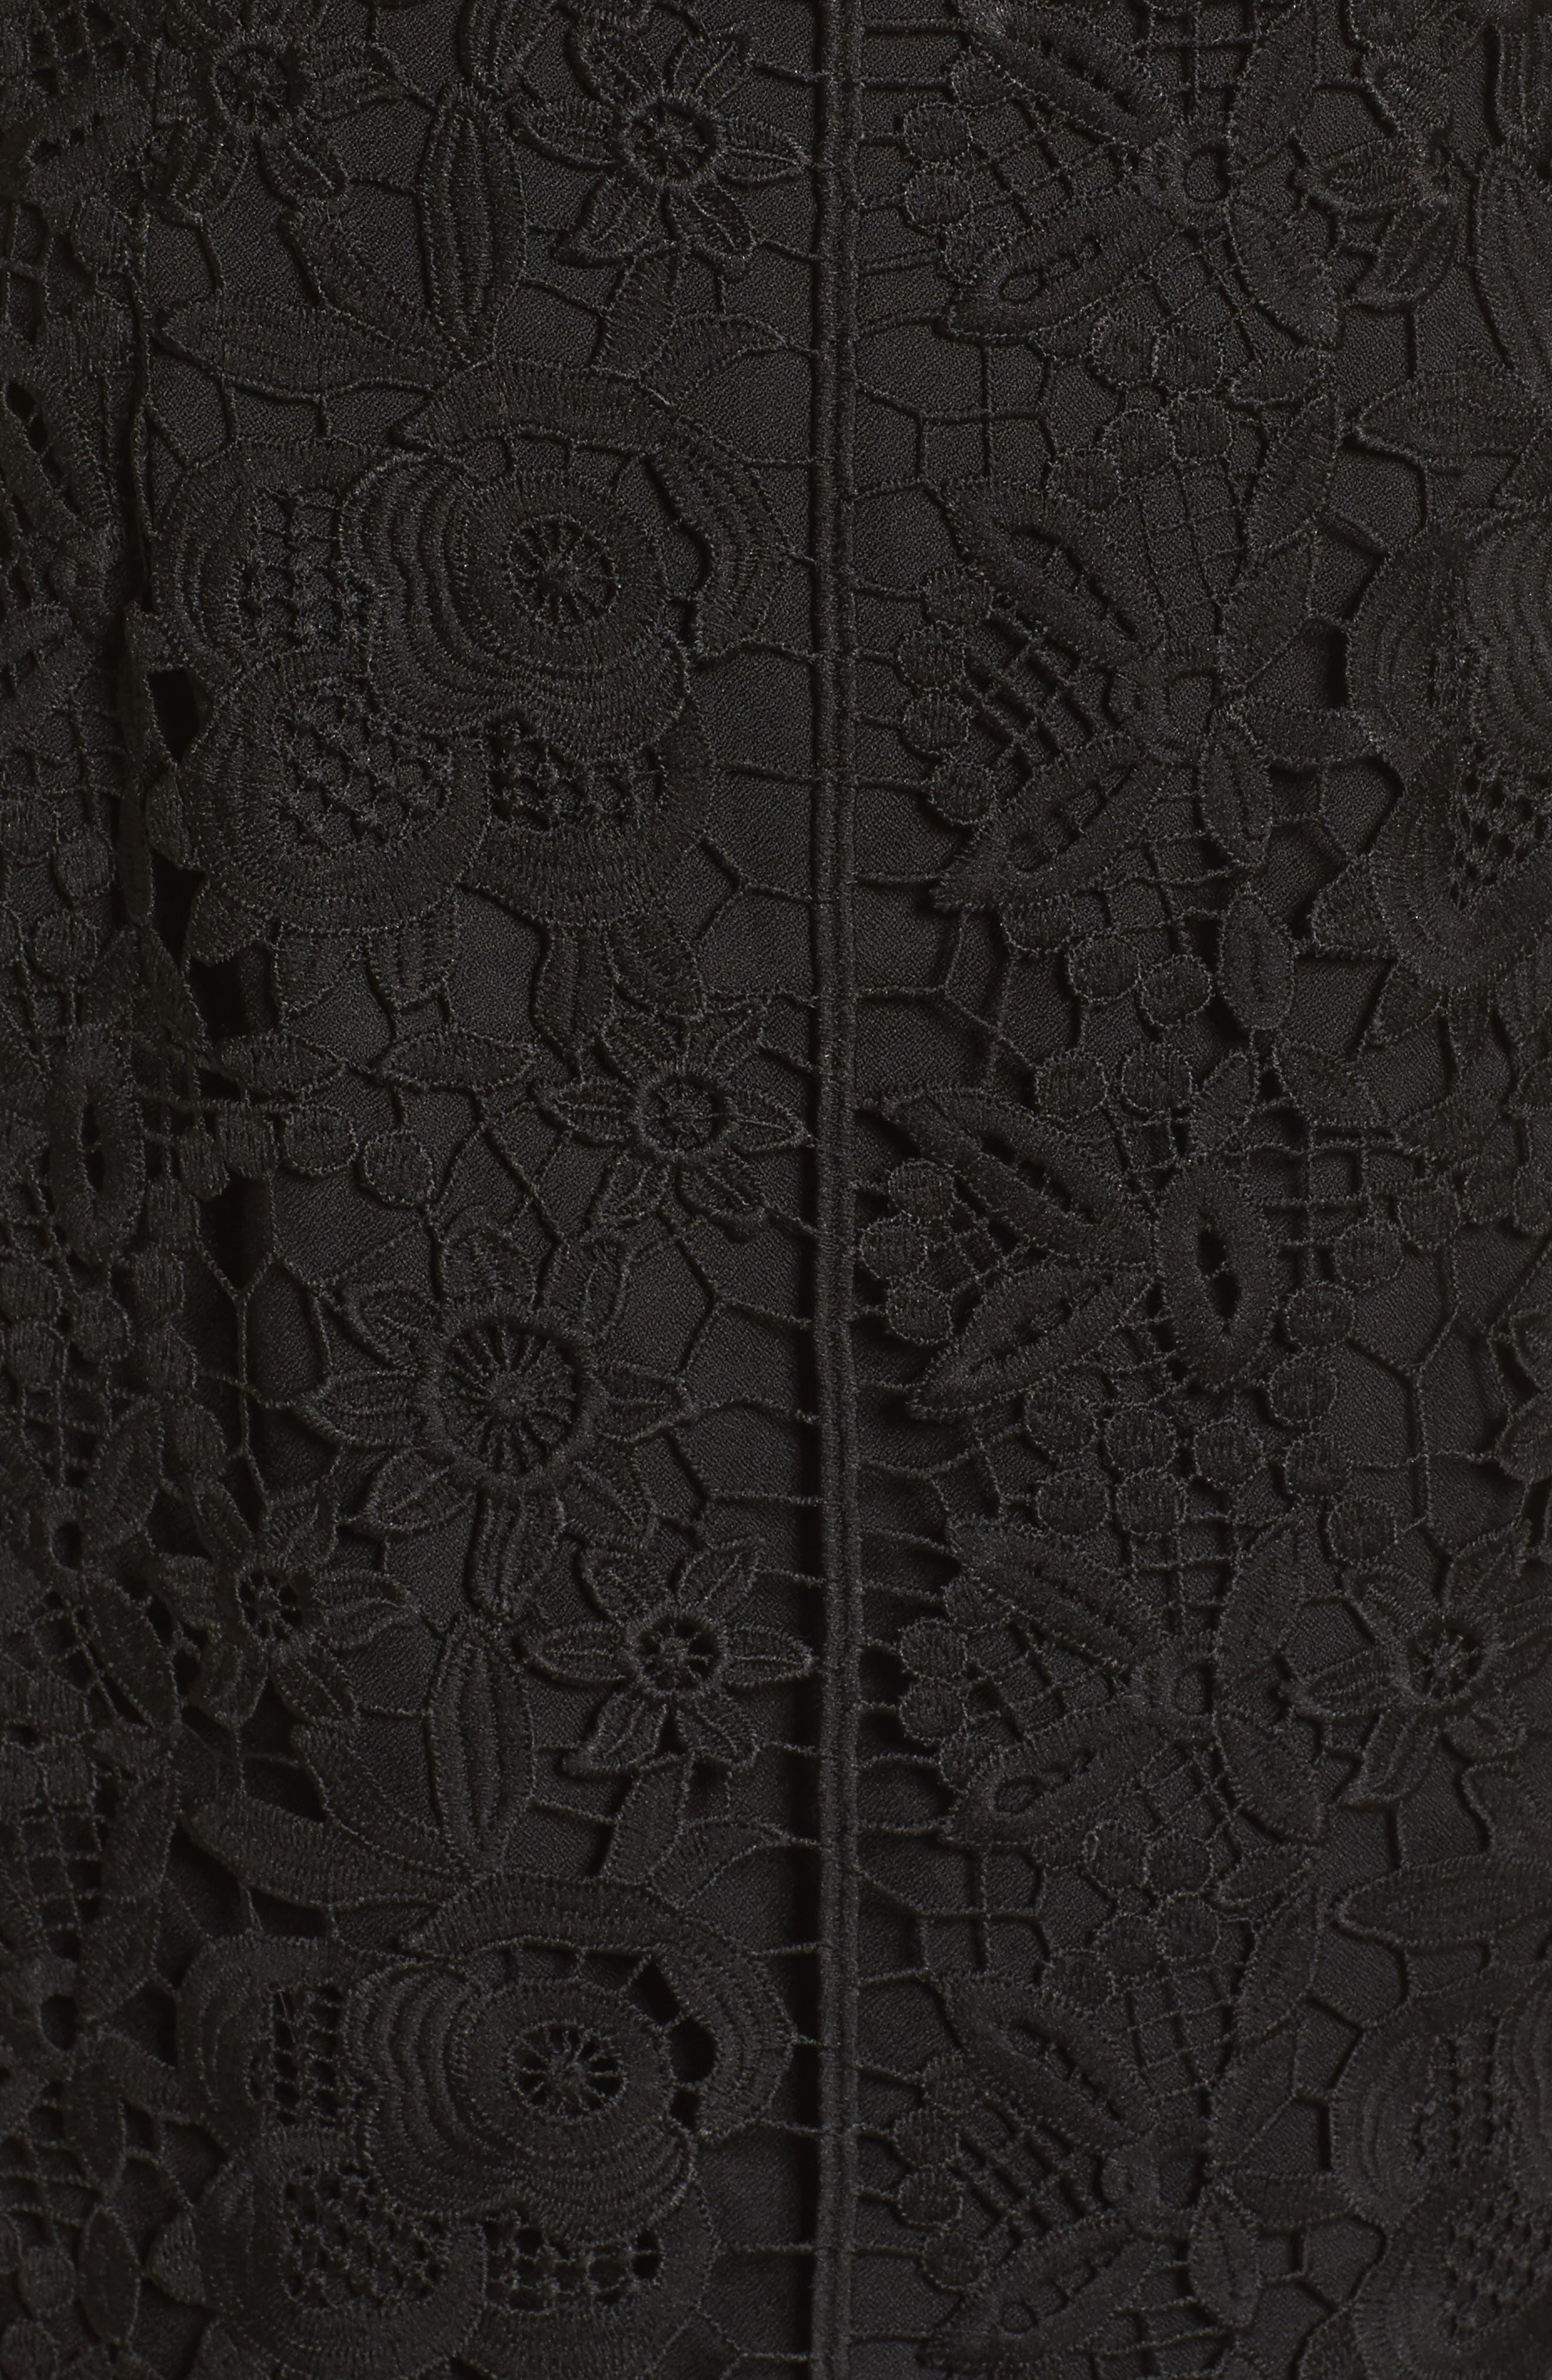 Xenia Strapless Lace Midi Dress,                             Alternate thumbnail 5, color,                             001